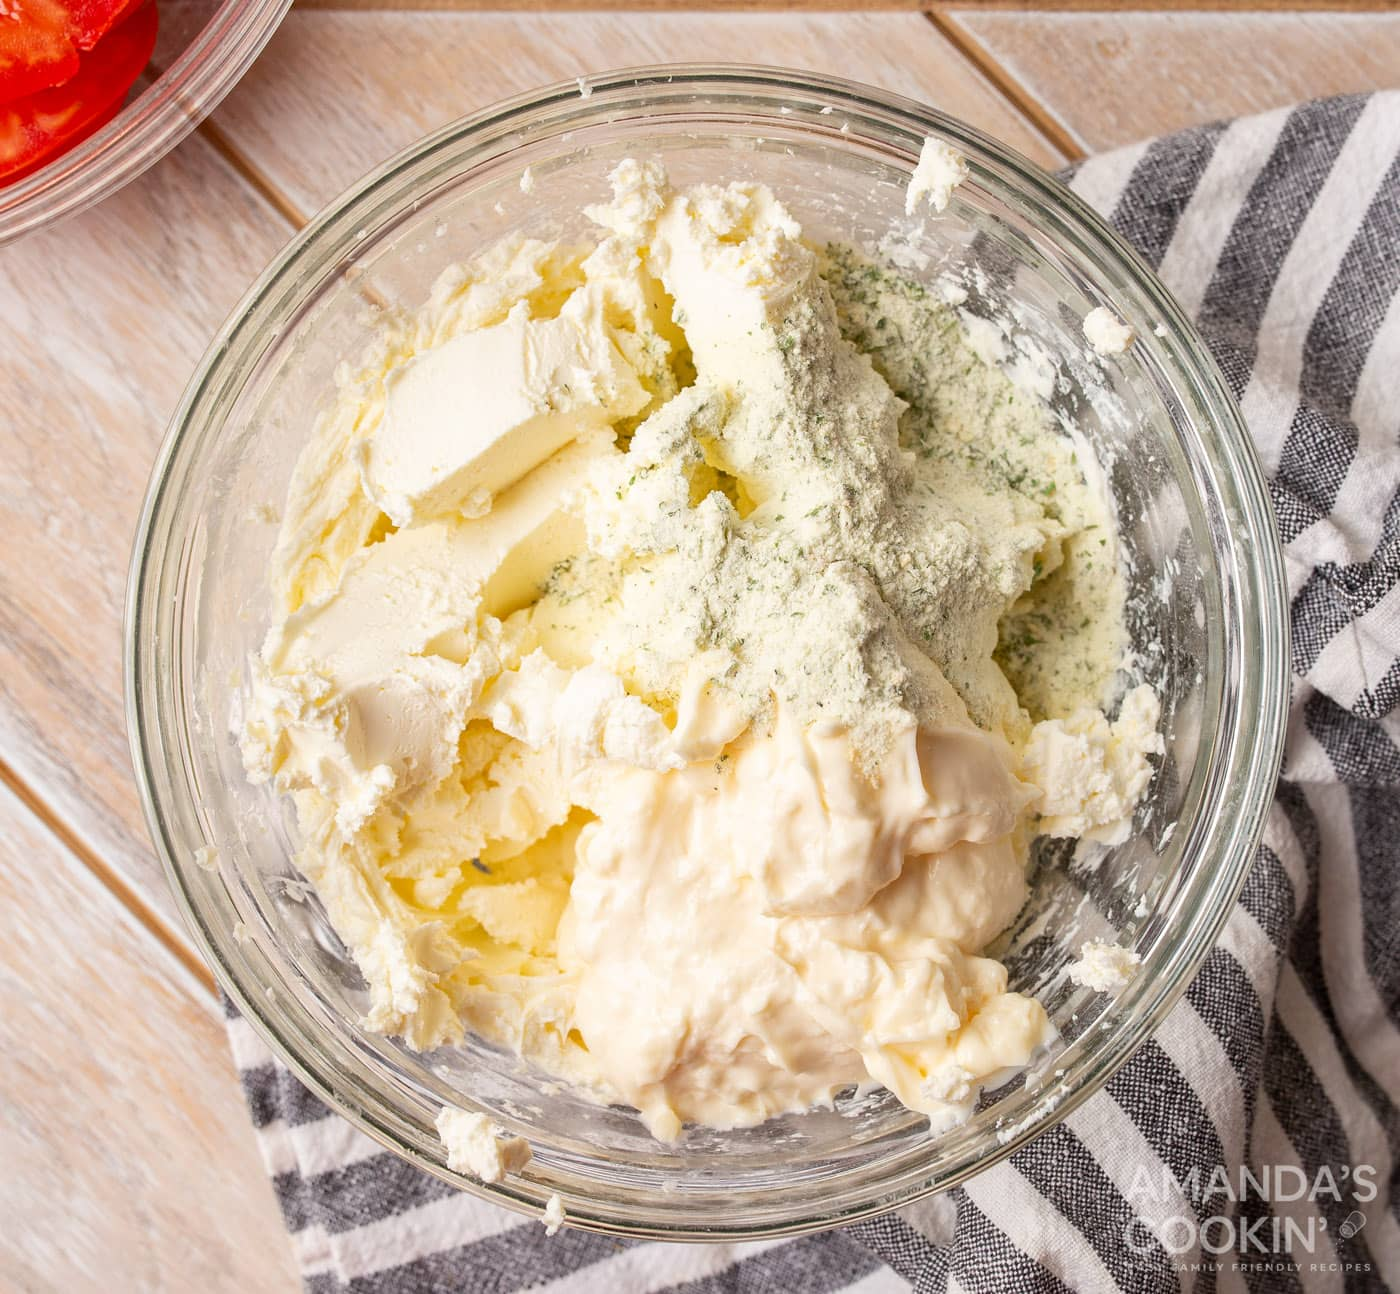 cream cheese, mayo, and ranch seasoning in a bowl